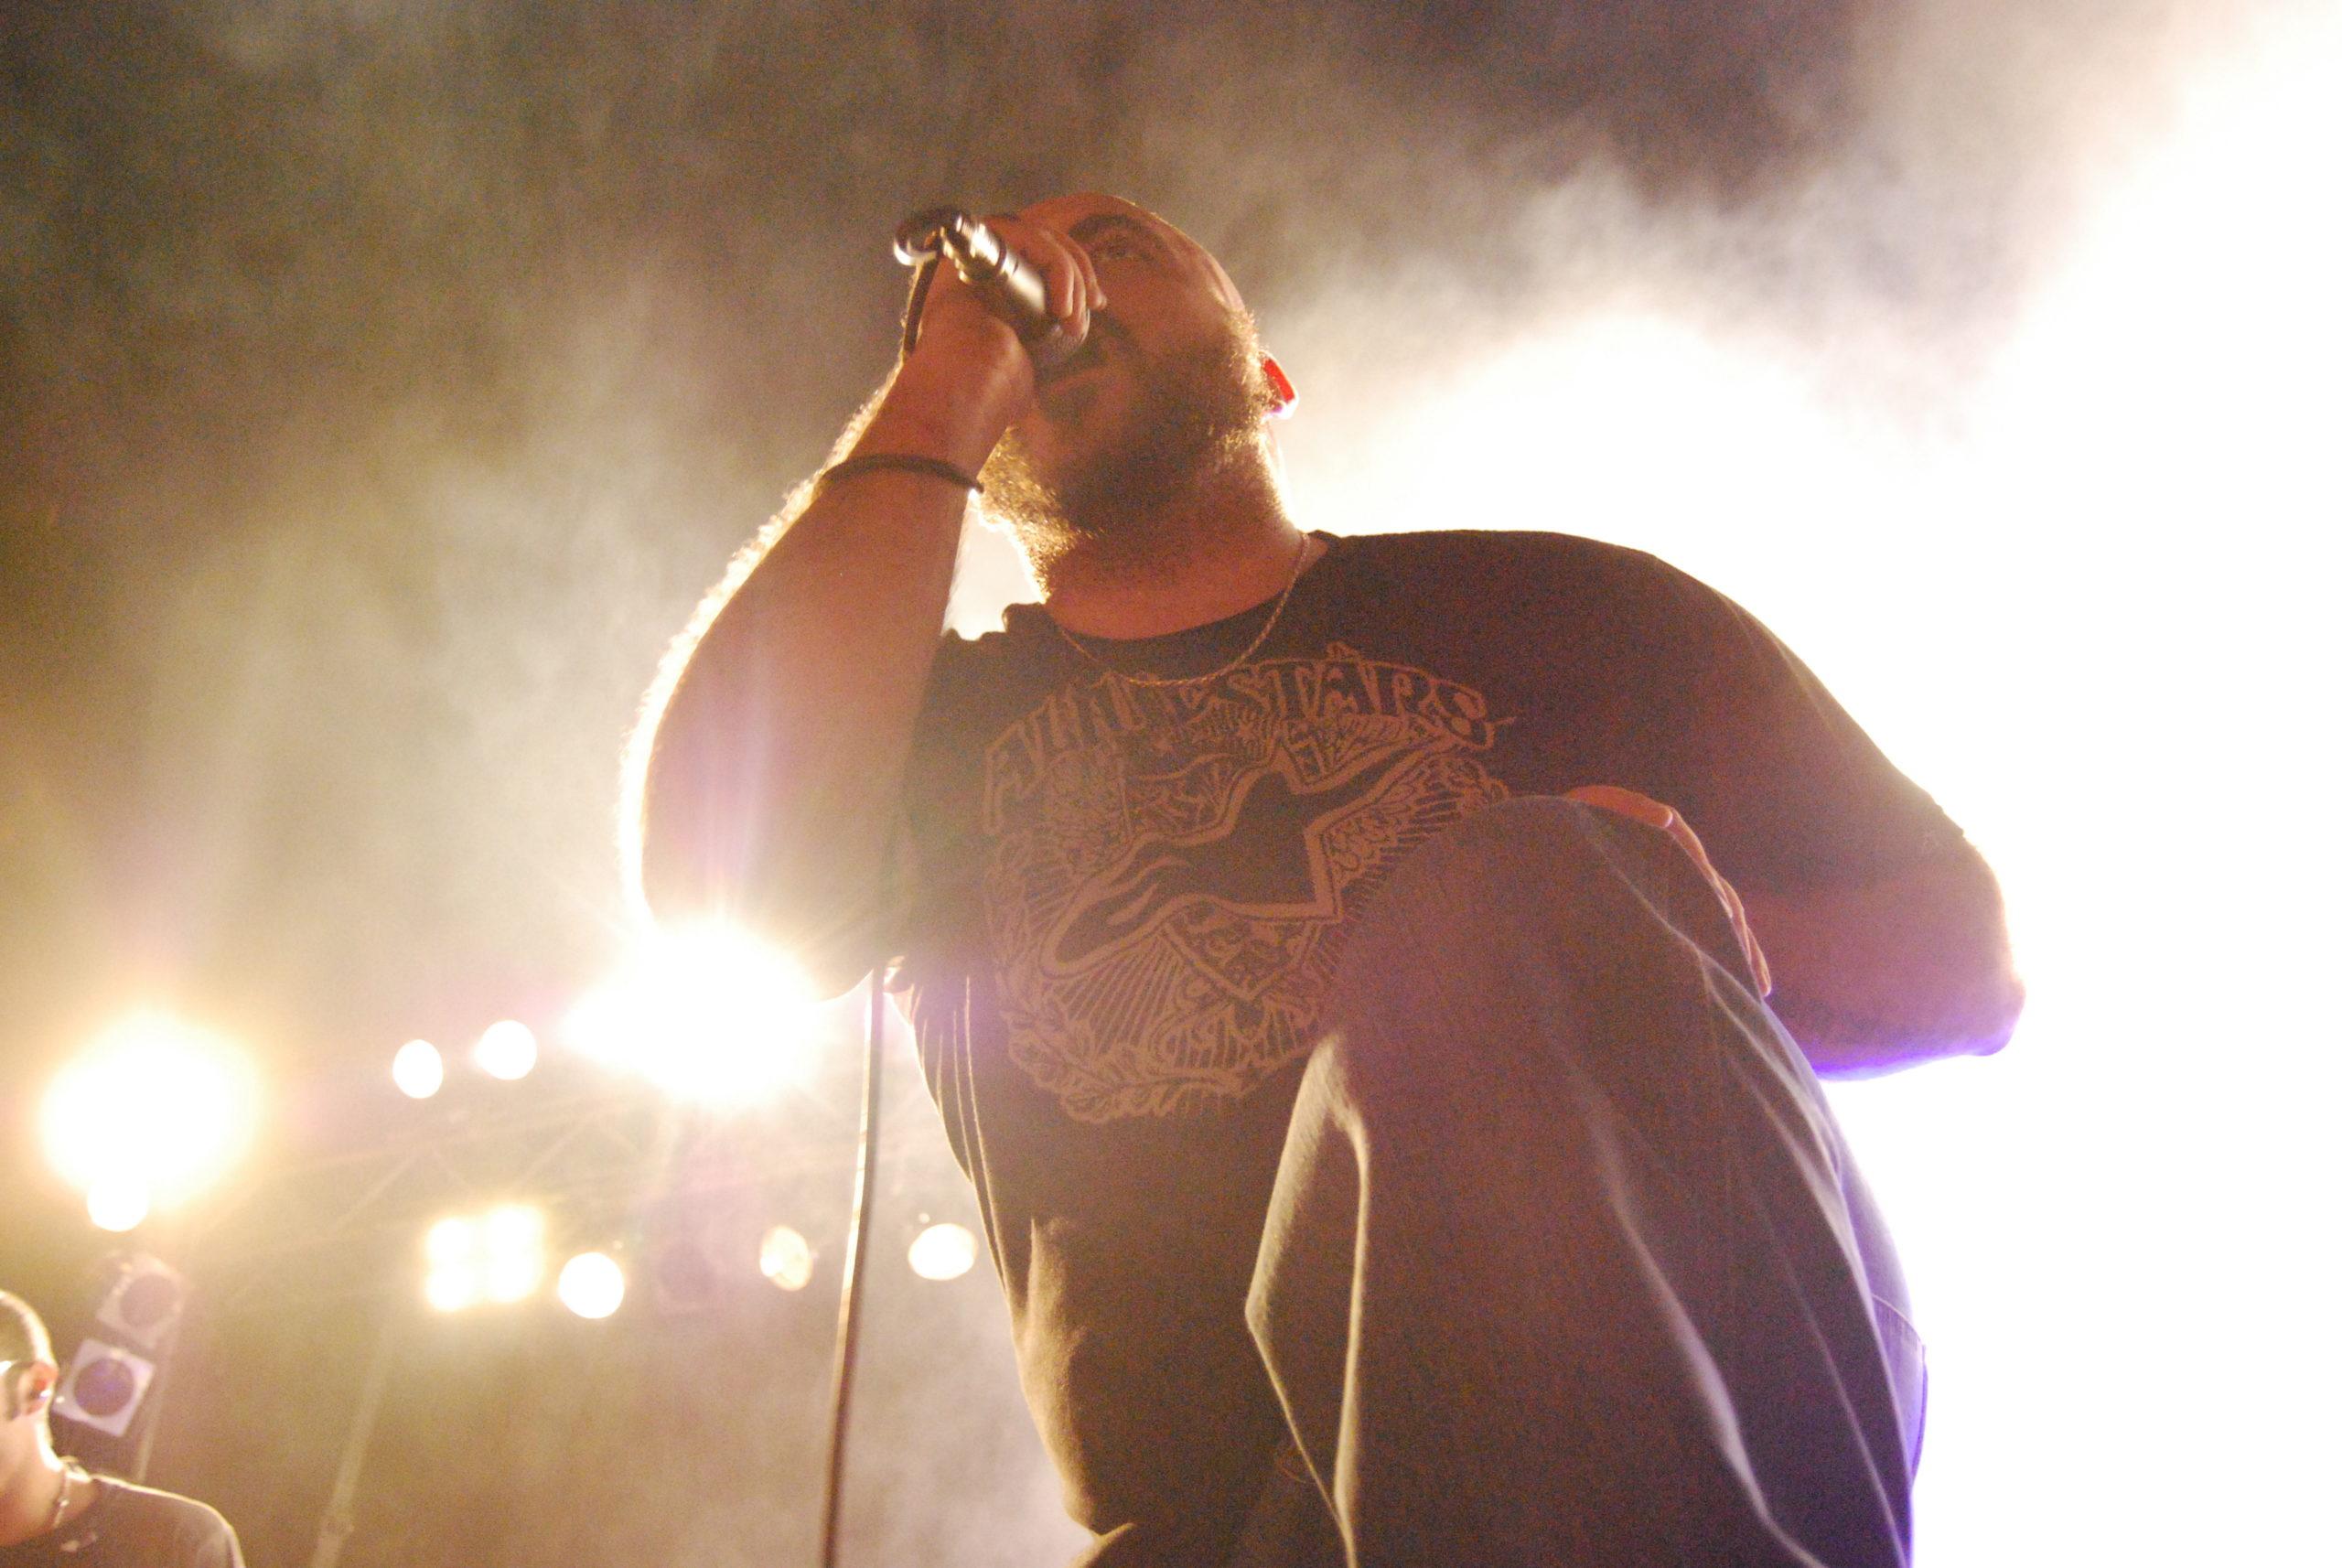 Fantarock 2009